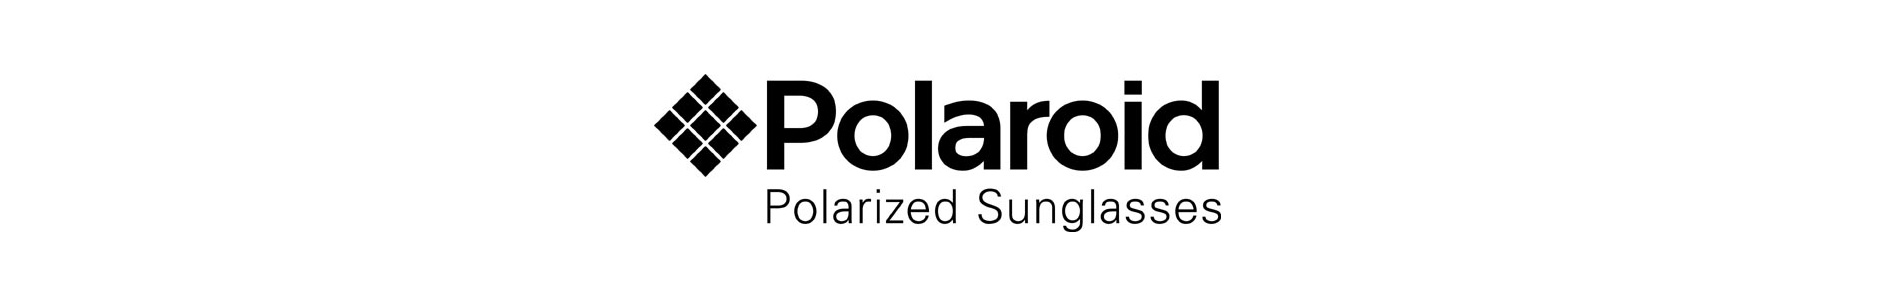 876672ac34f Polaroid Kids Prescription Sunglasses - Free Lenses and Free Shipping